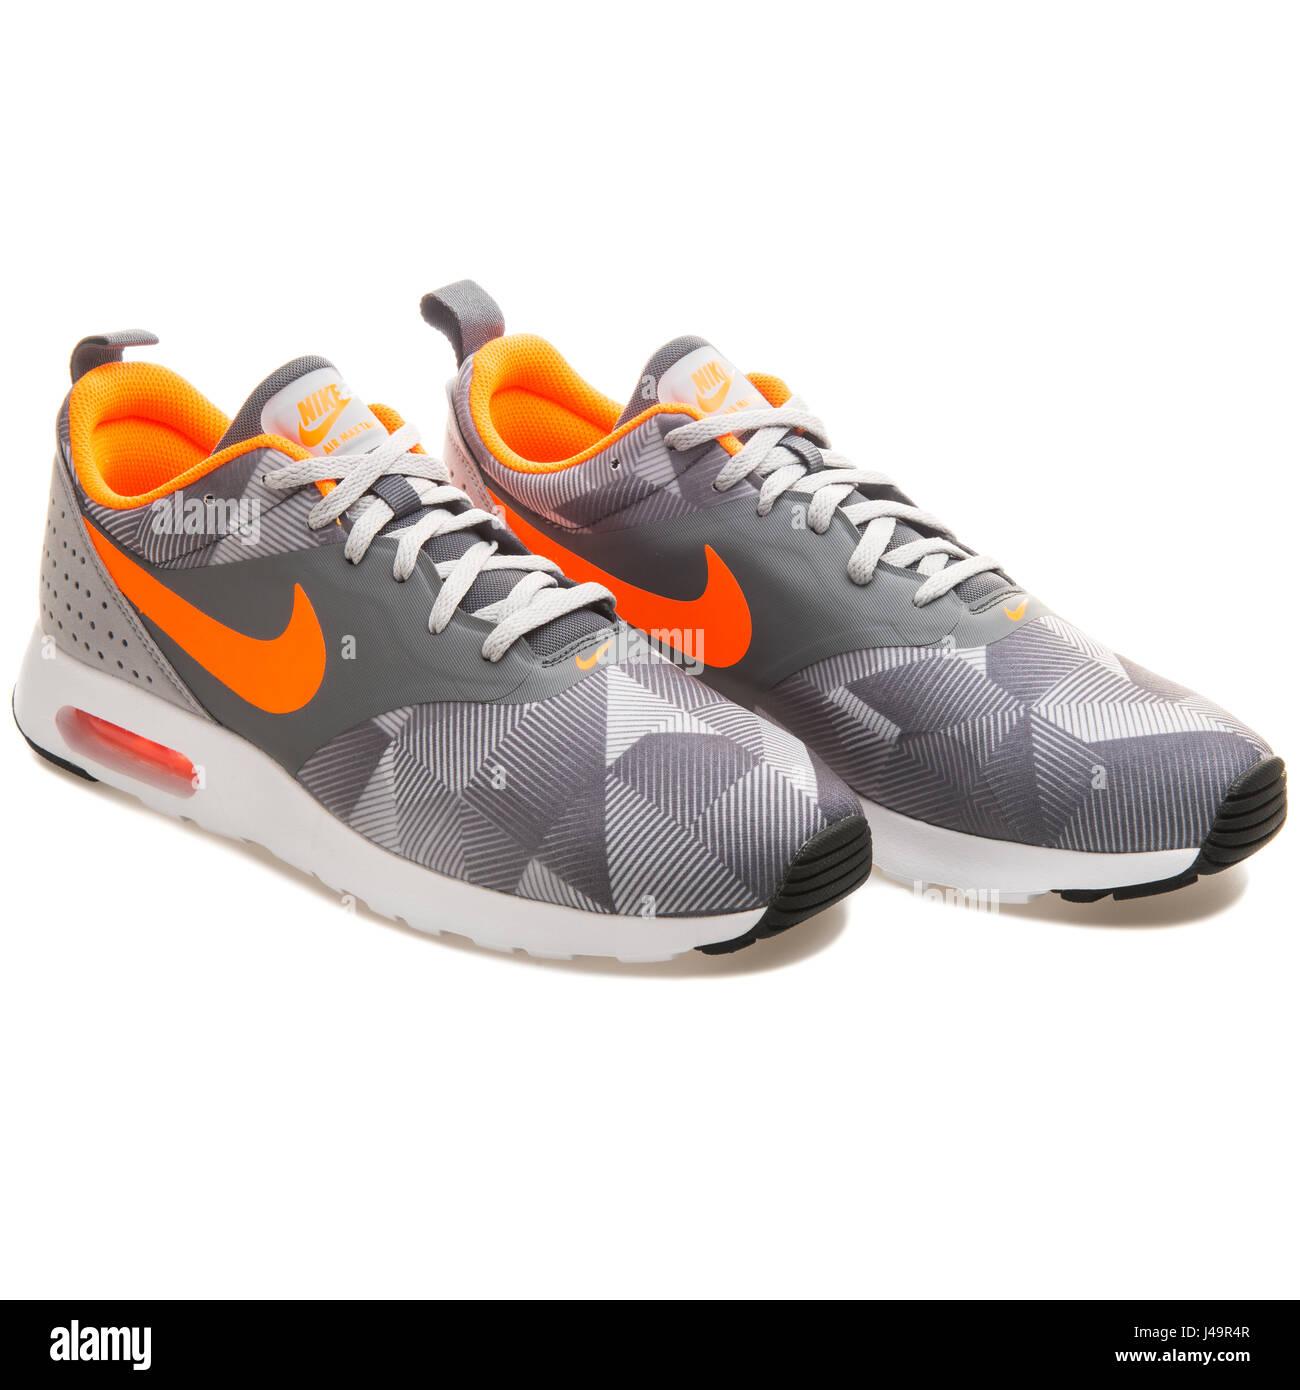 best sneakers 1cd58 176b5 Nike Air Max Tavas Print Dark Grey Orange - 742781-018